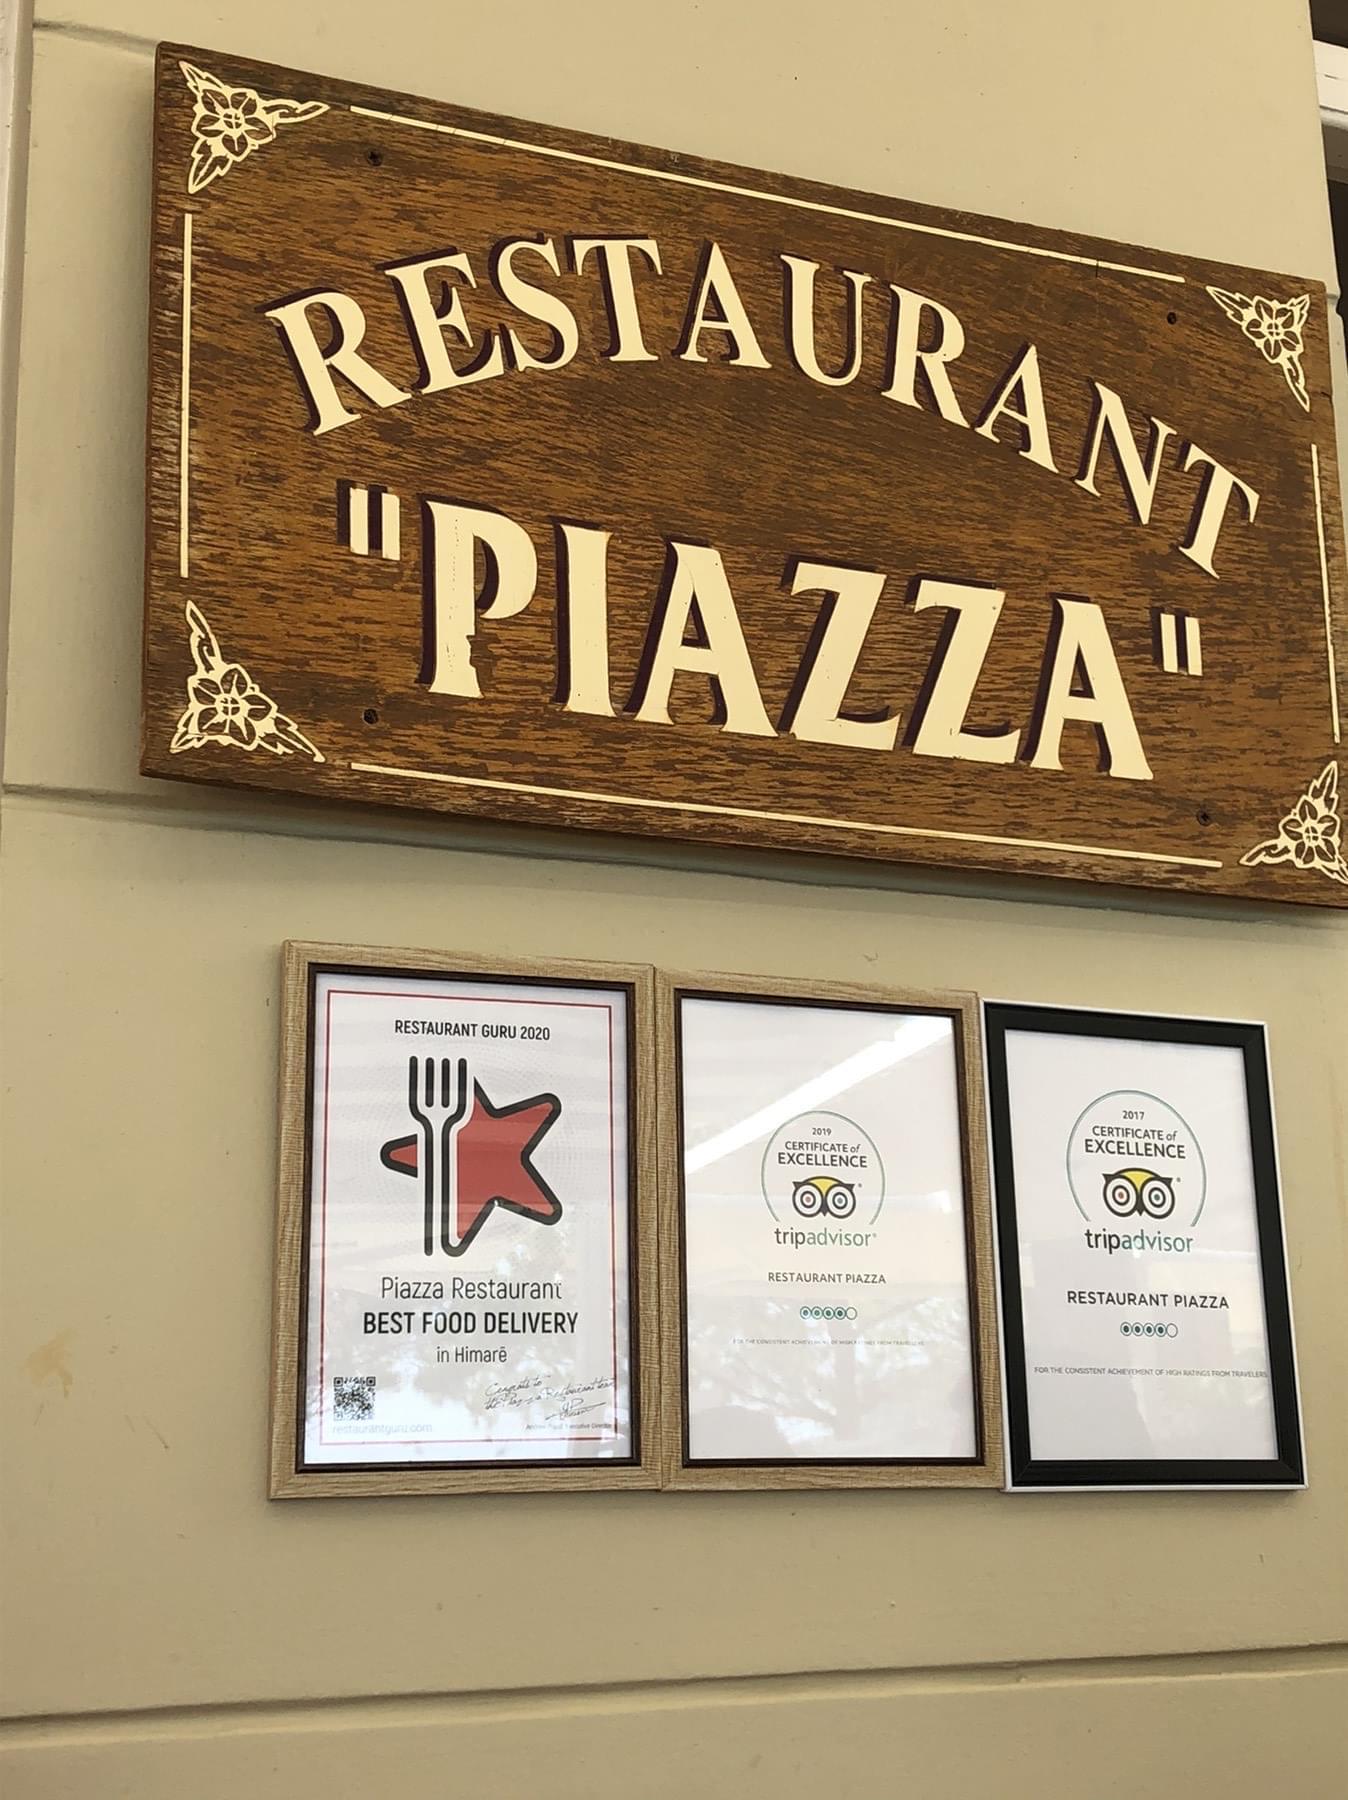 Piazza Restaurant award